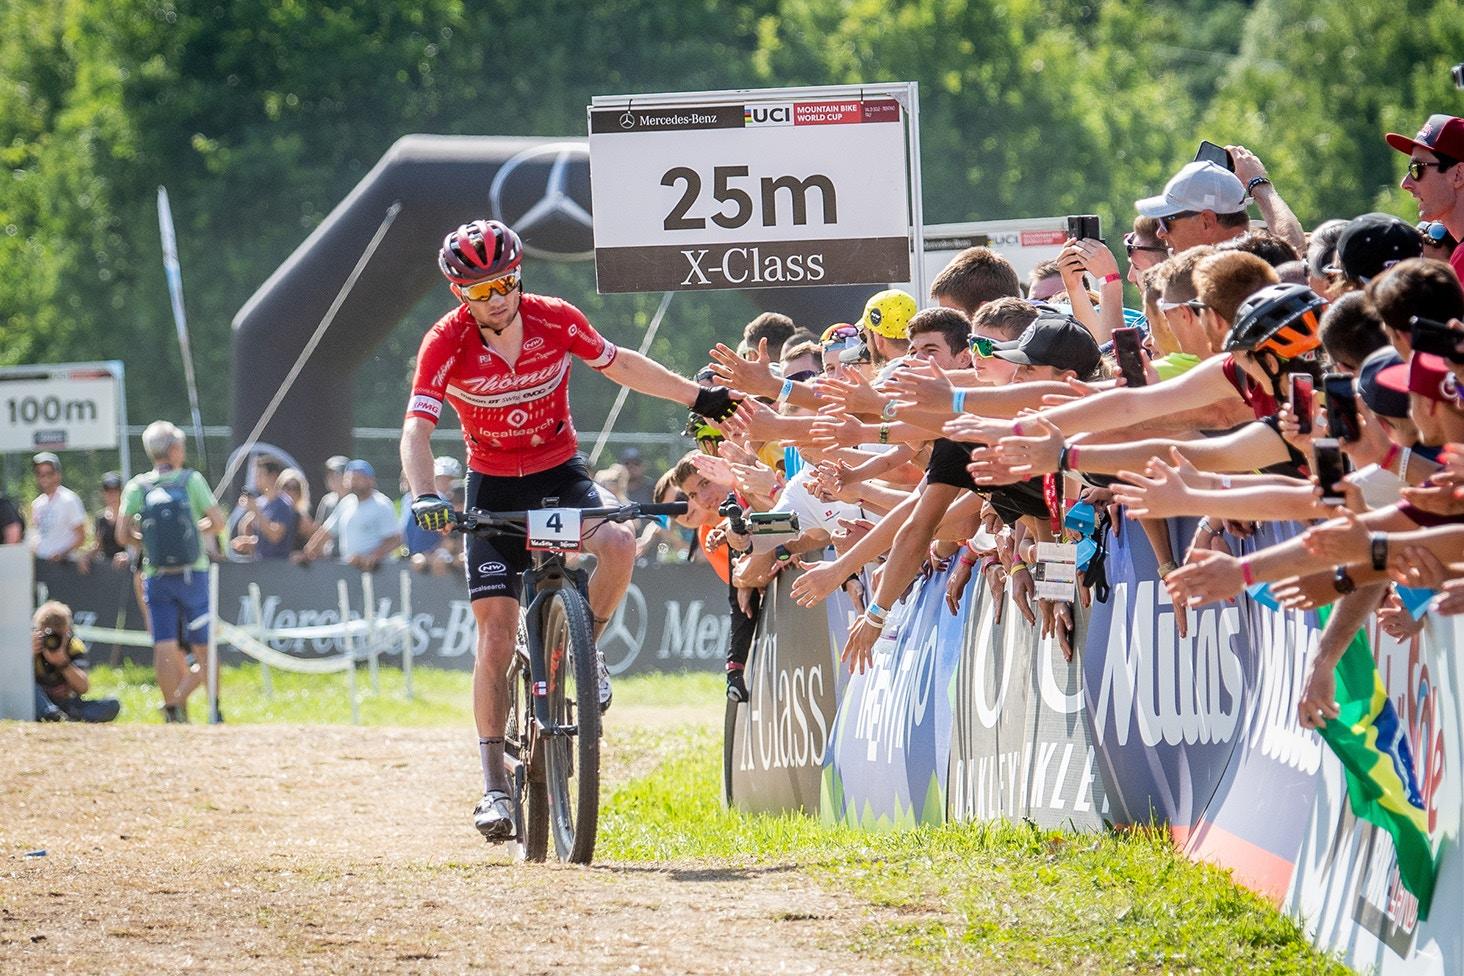 Northwave - Val Di Sole: Northwave wins the Fluckinger